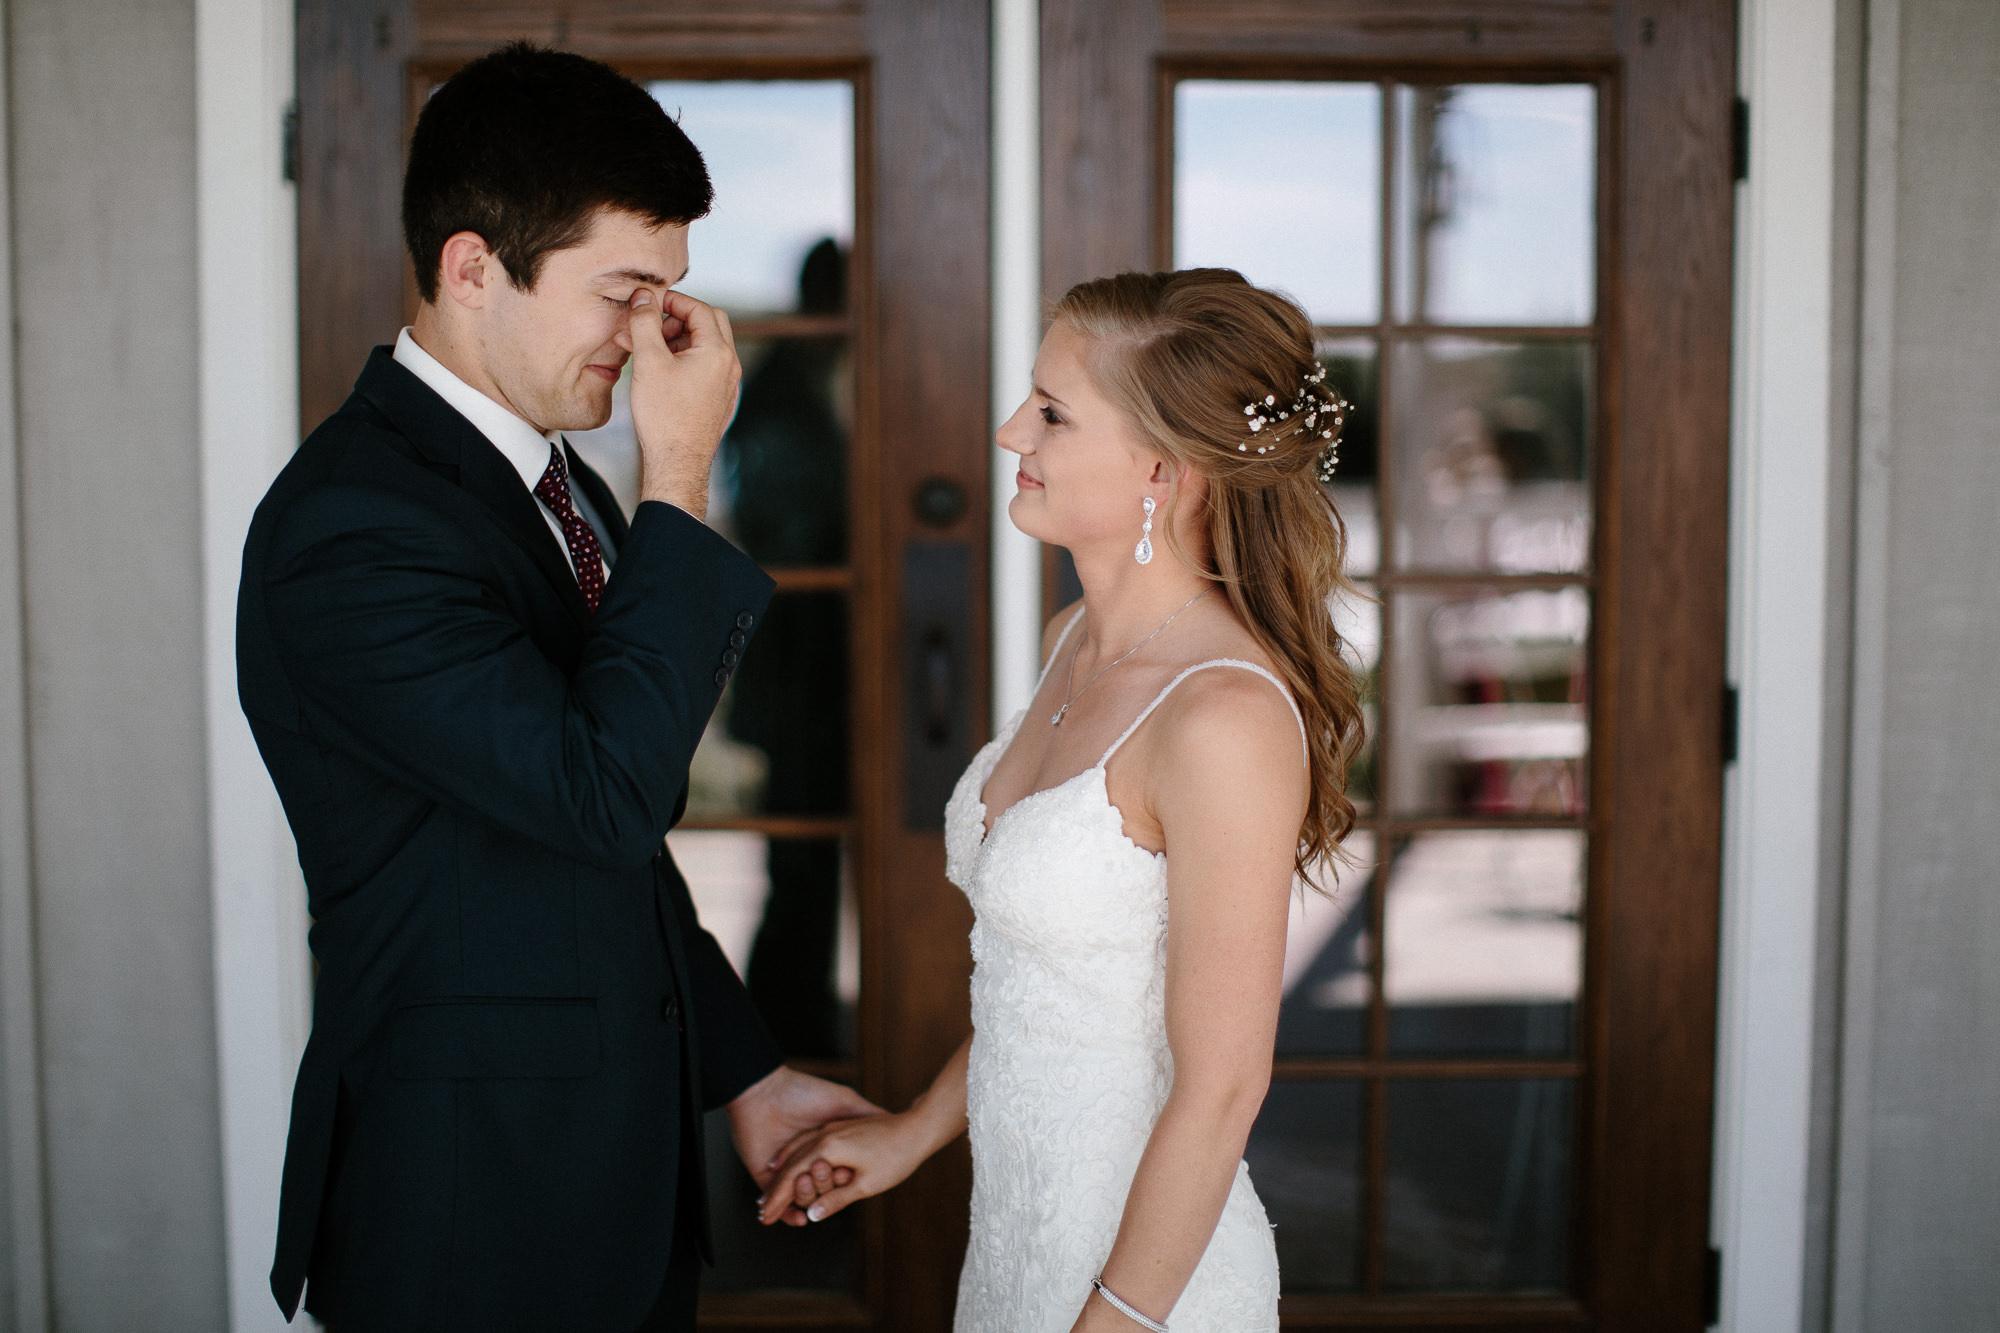 wedding-elopement-adventerous-romantic-timeless-south-dakota-blue-haven-barn-023.jpg